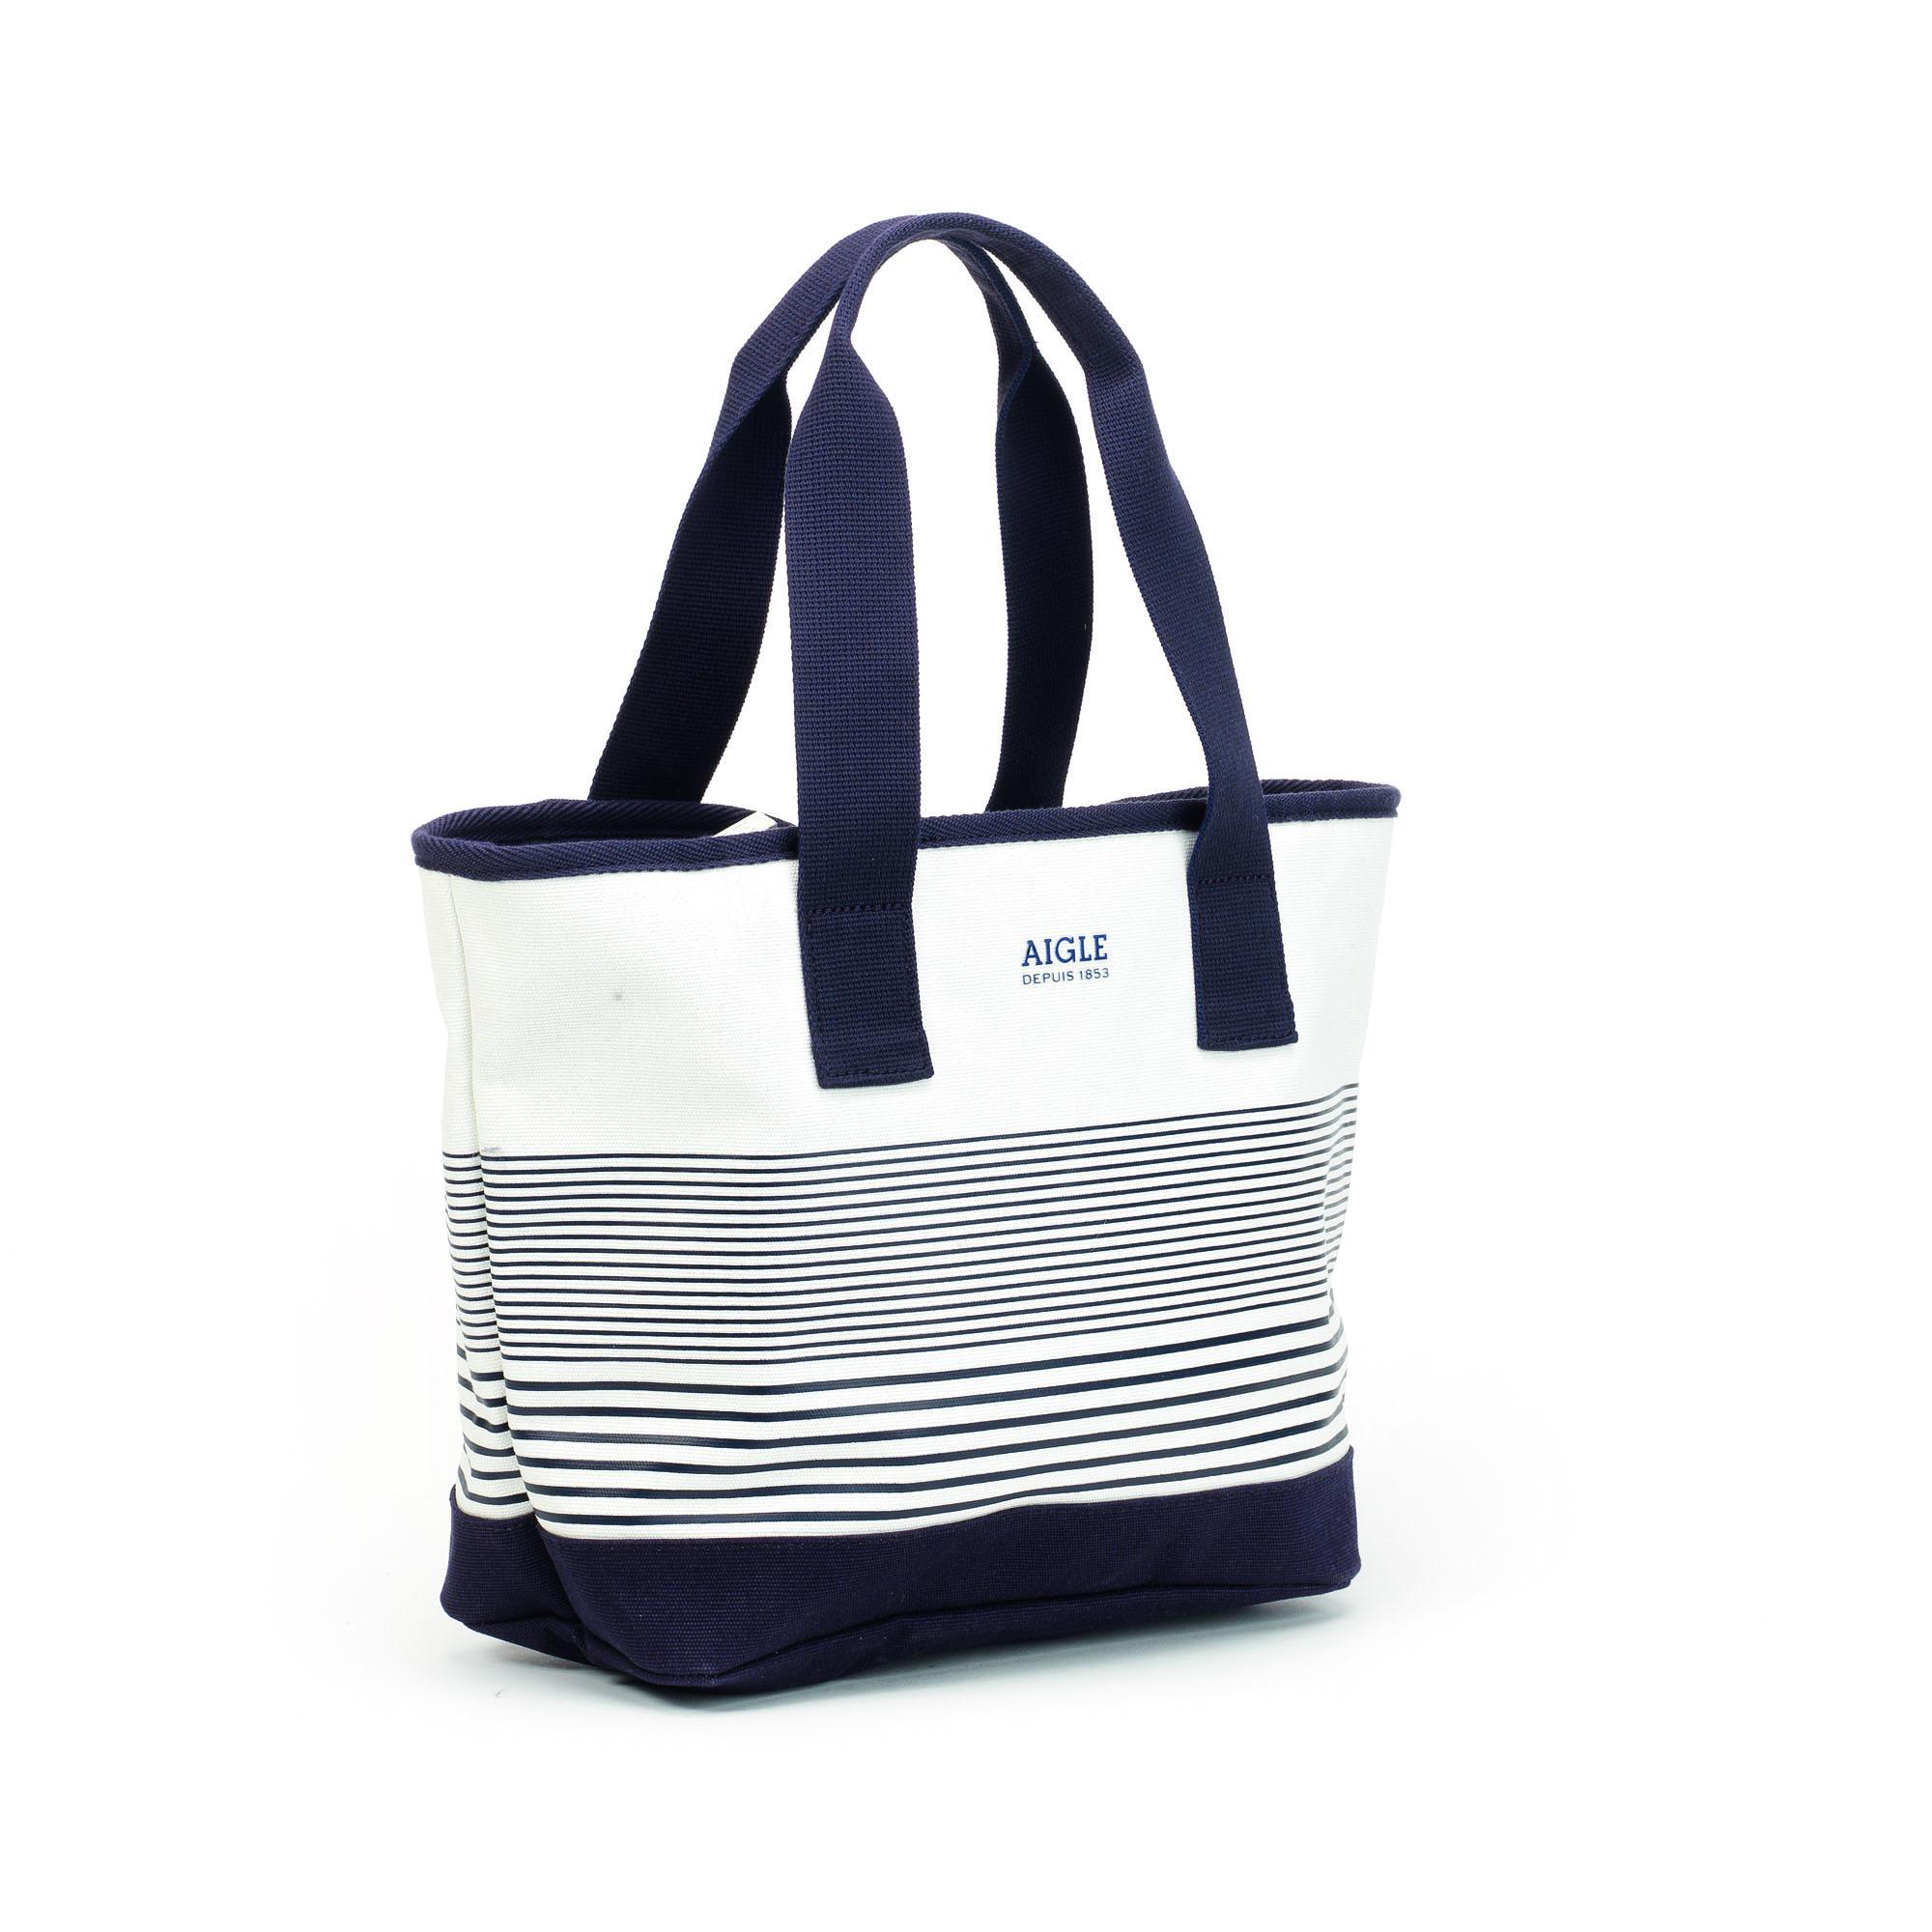 SEASIDE BAG 2